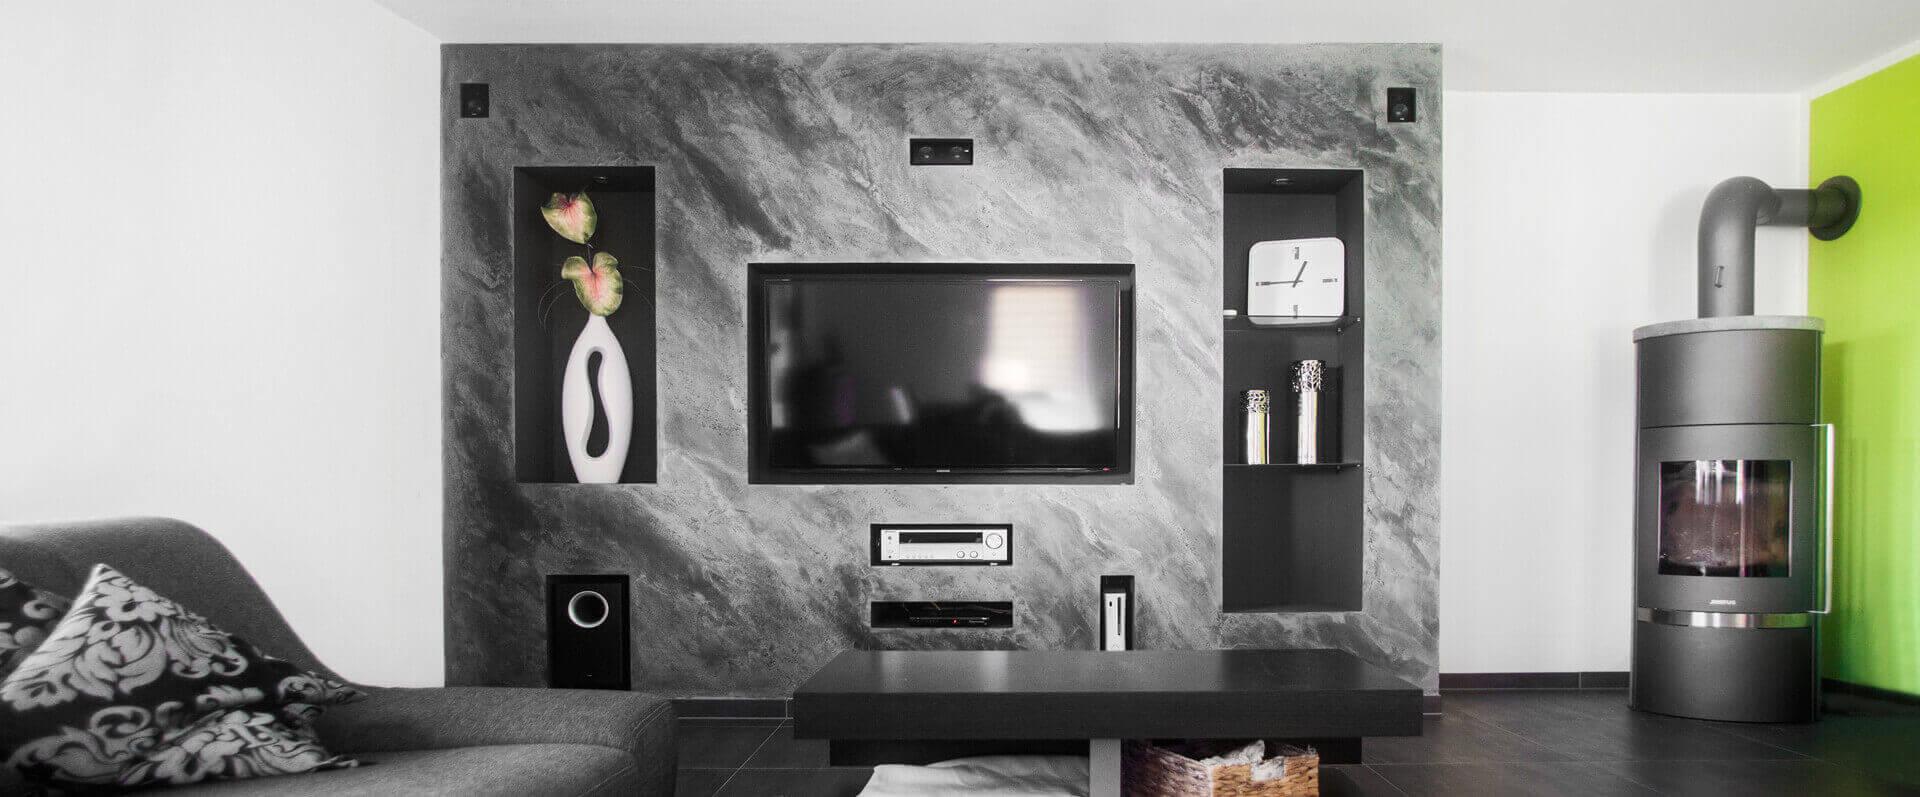 Innenausbau hg raumdesign gmbh for Raum design